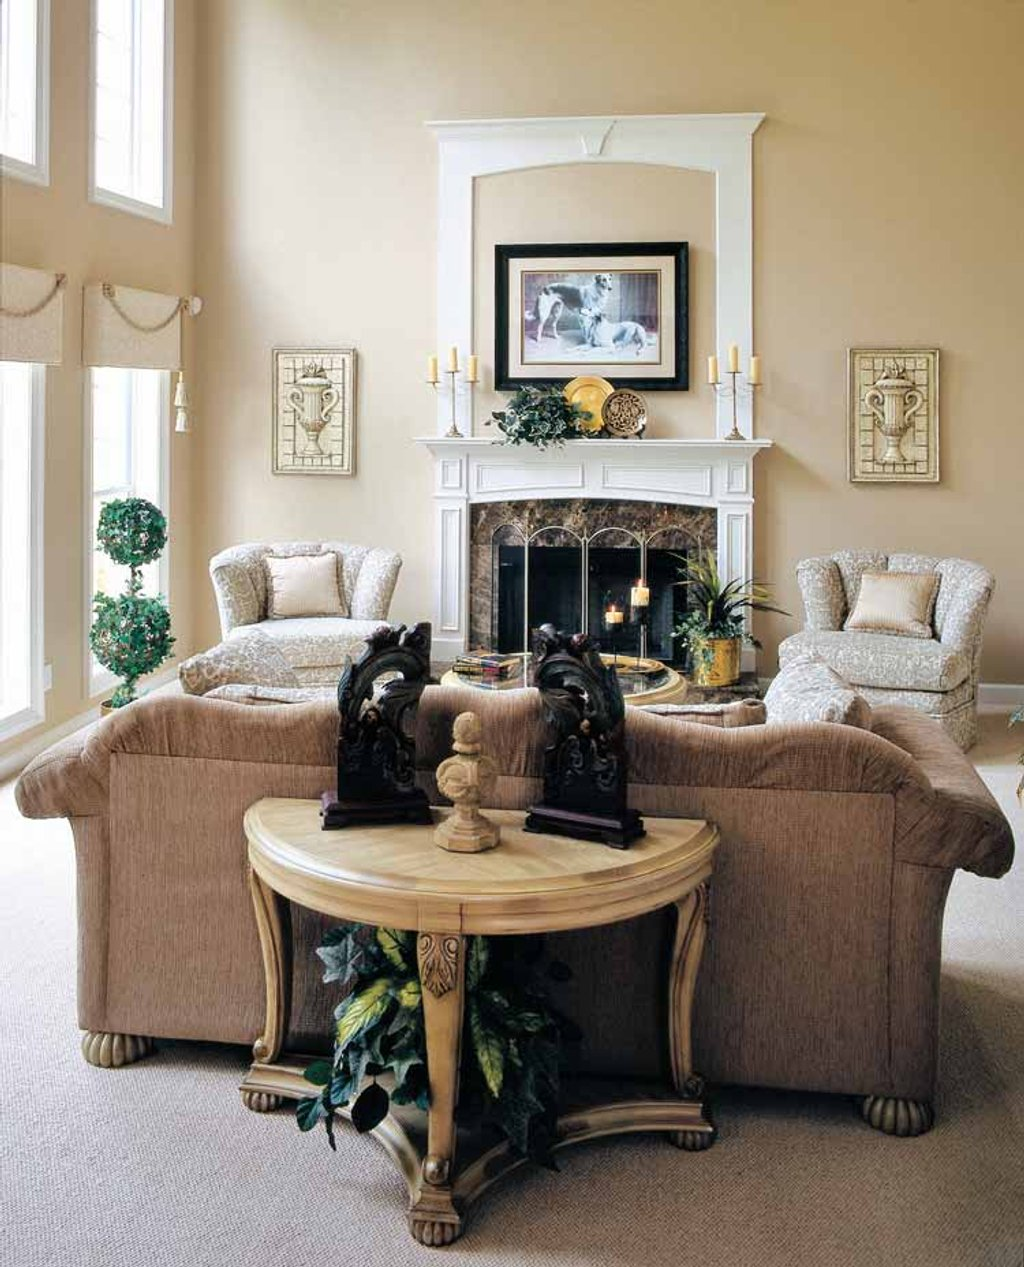 L Shaped Single Storey Homes Interior Design I J C Mobile: Mediterranean Style House Plan